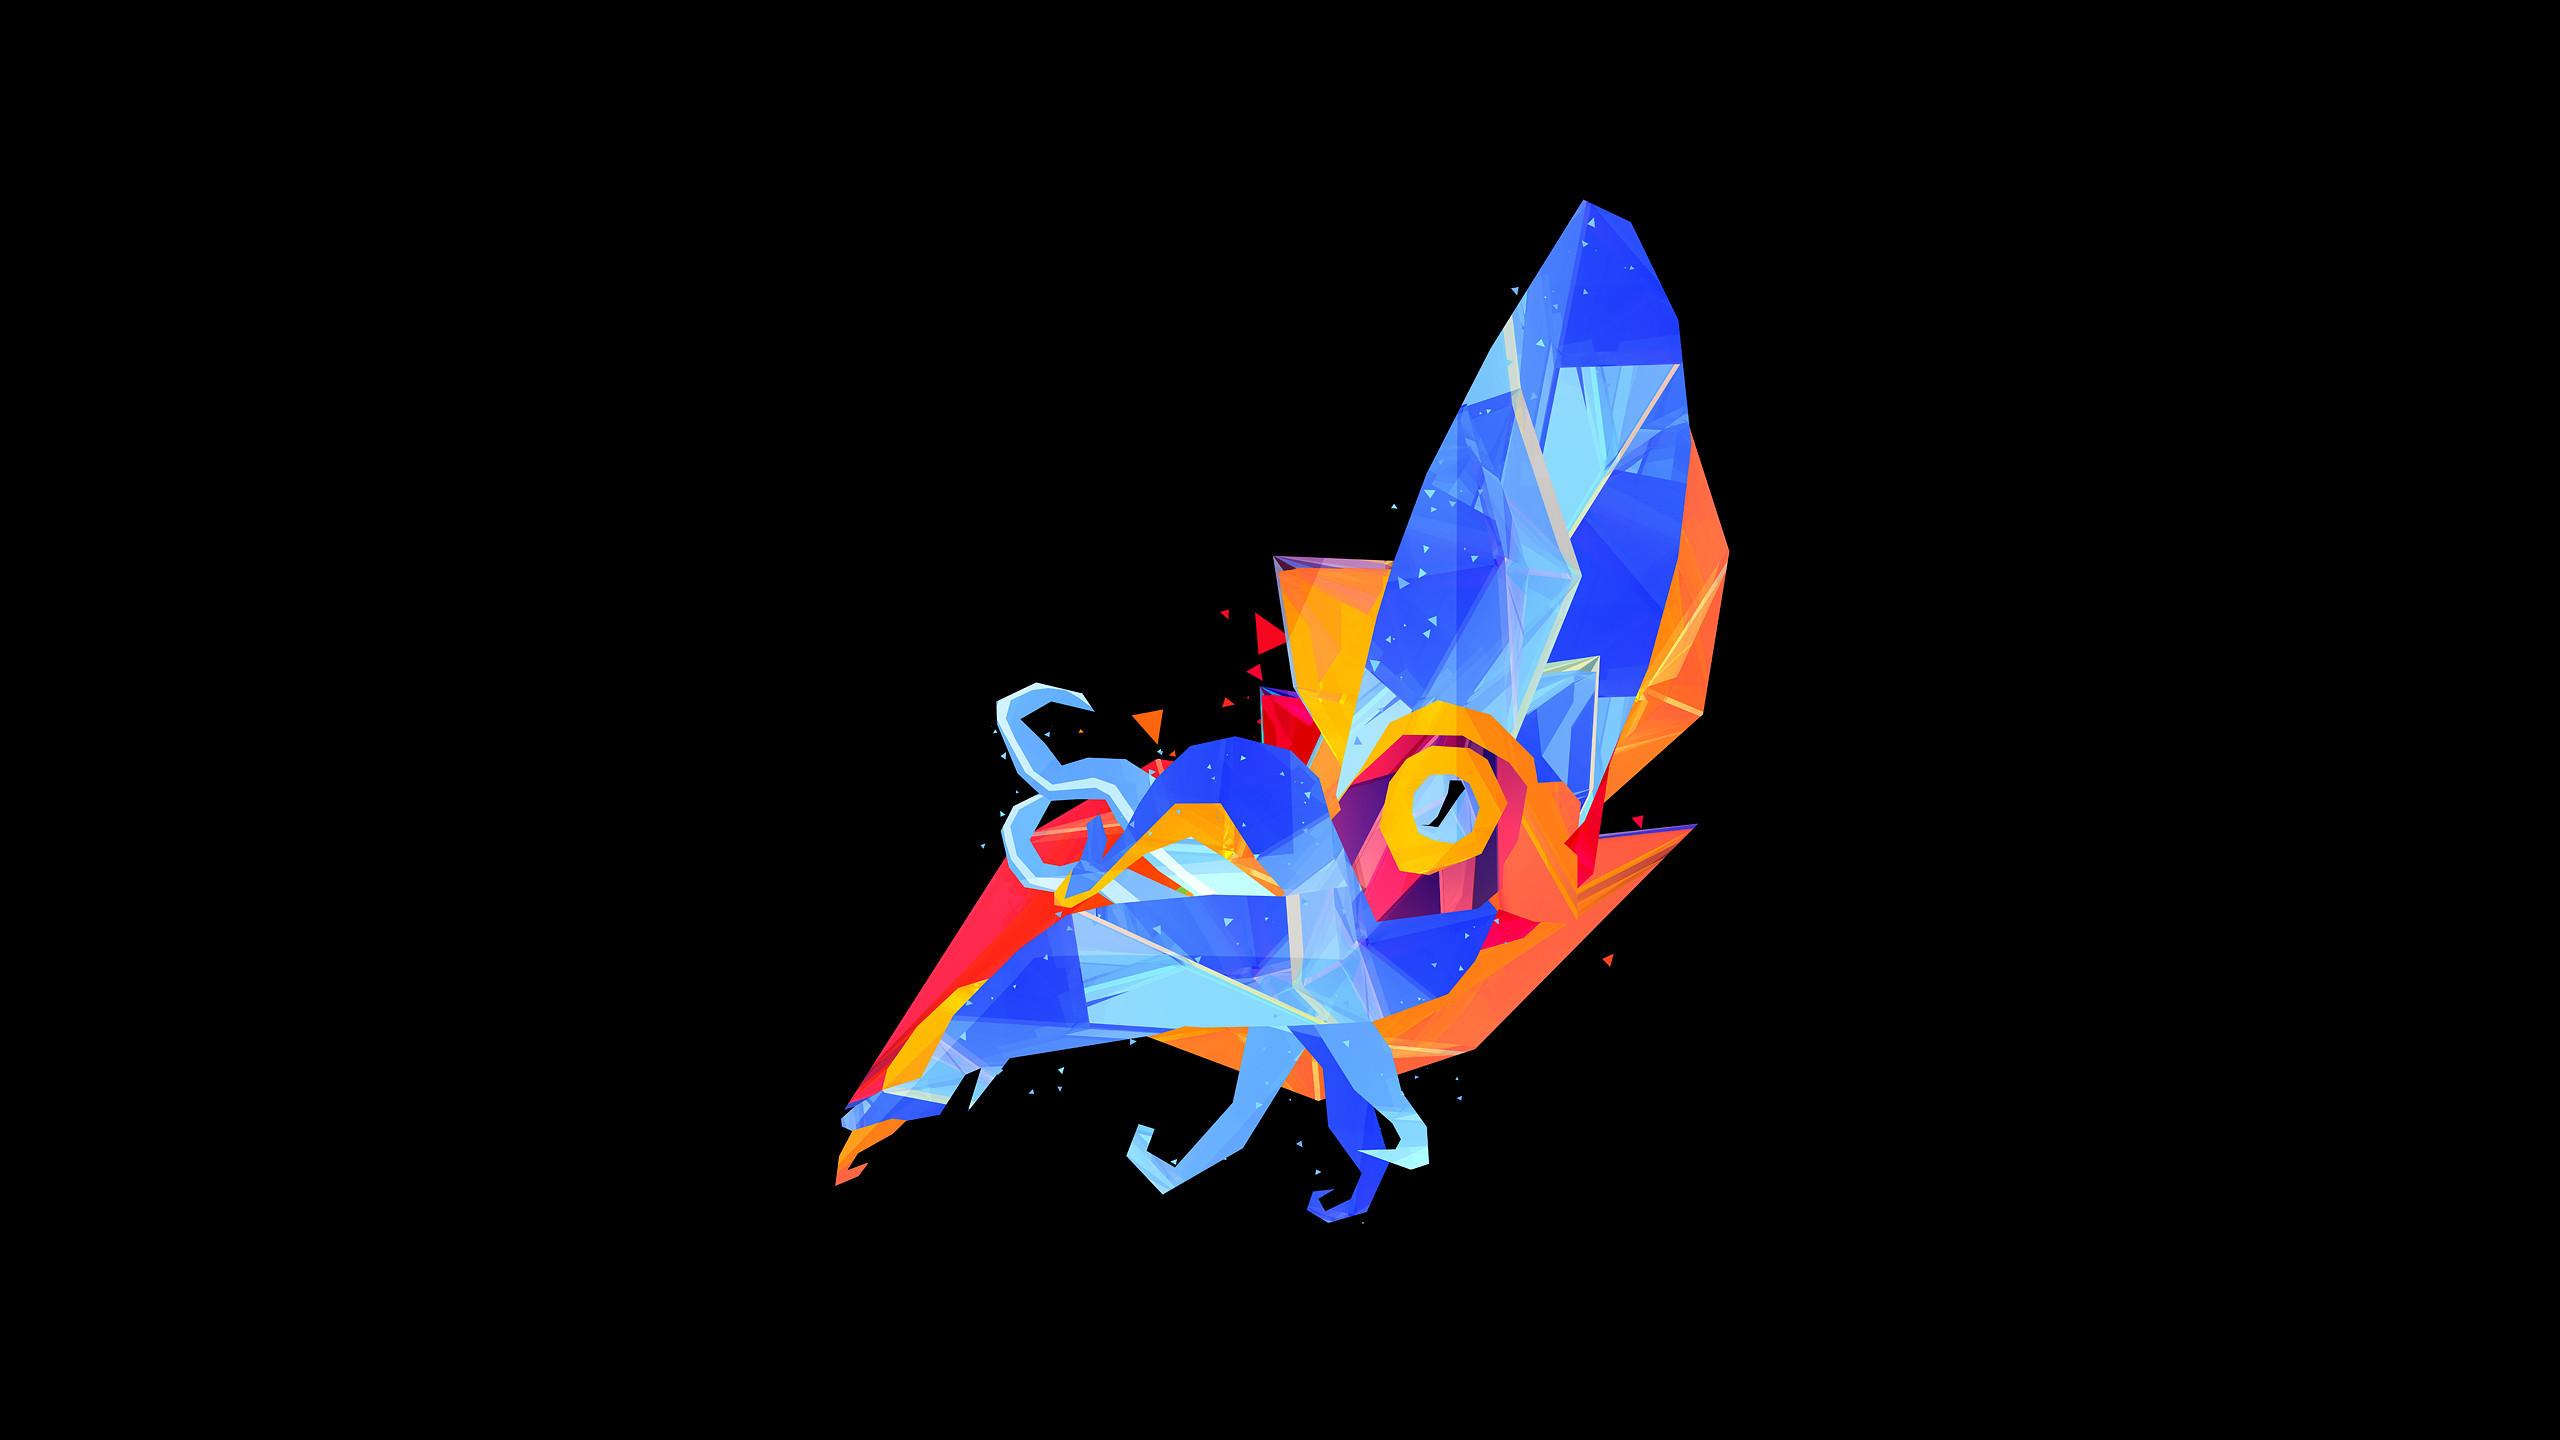 2560 x 1440. A squid. | Geometric and Polygon Wallpaper | Pinterest